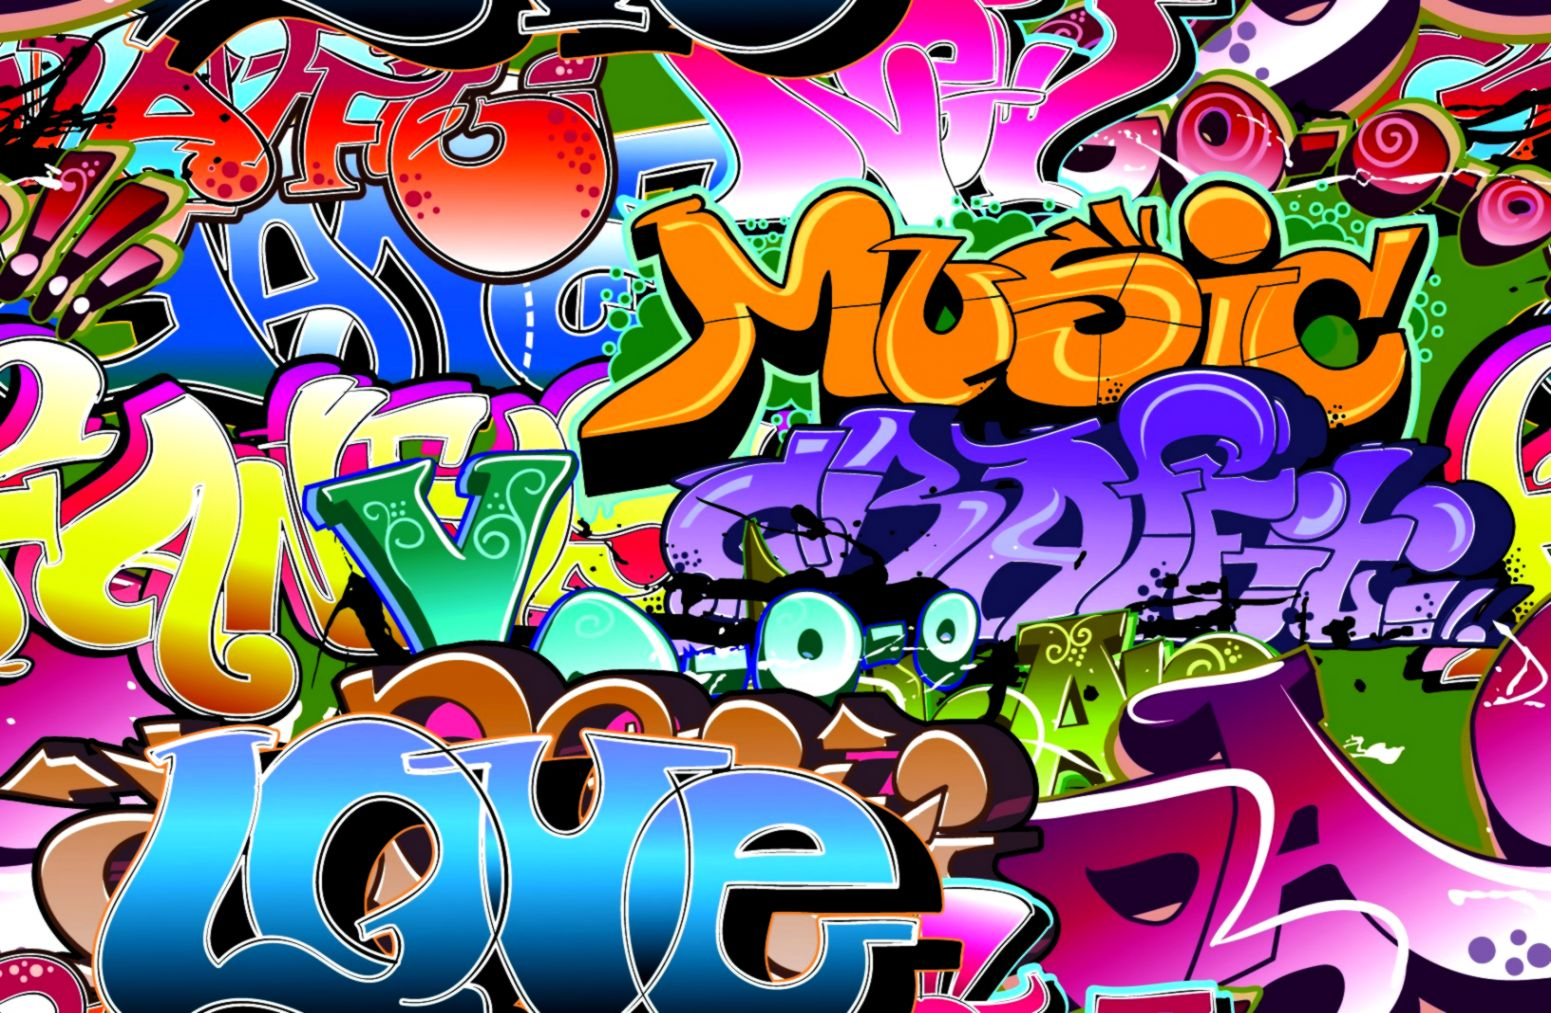 Cool Wallpapers Graffiti